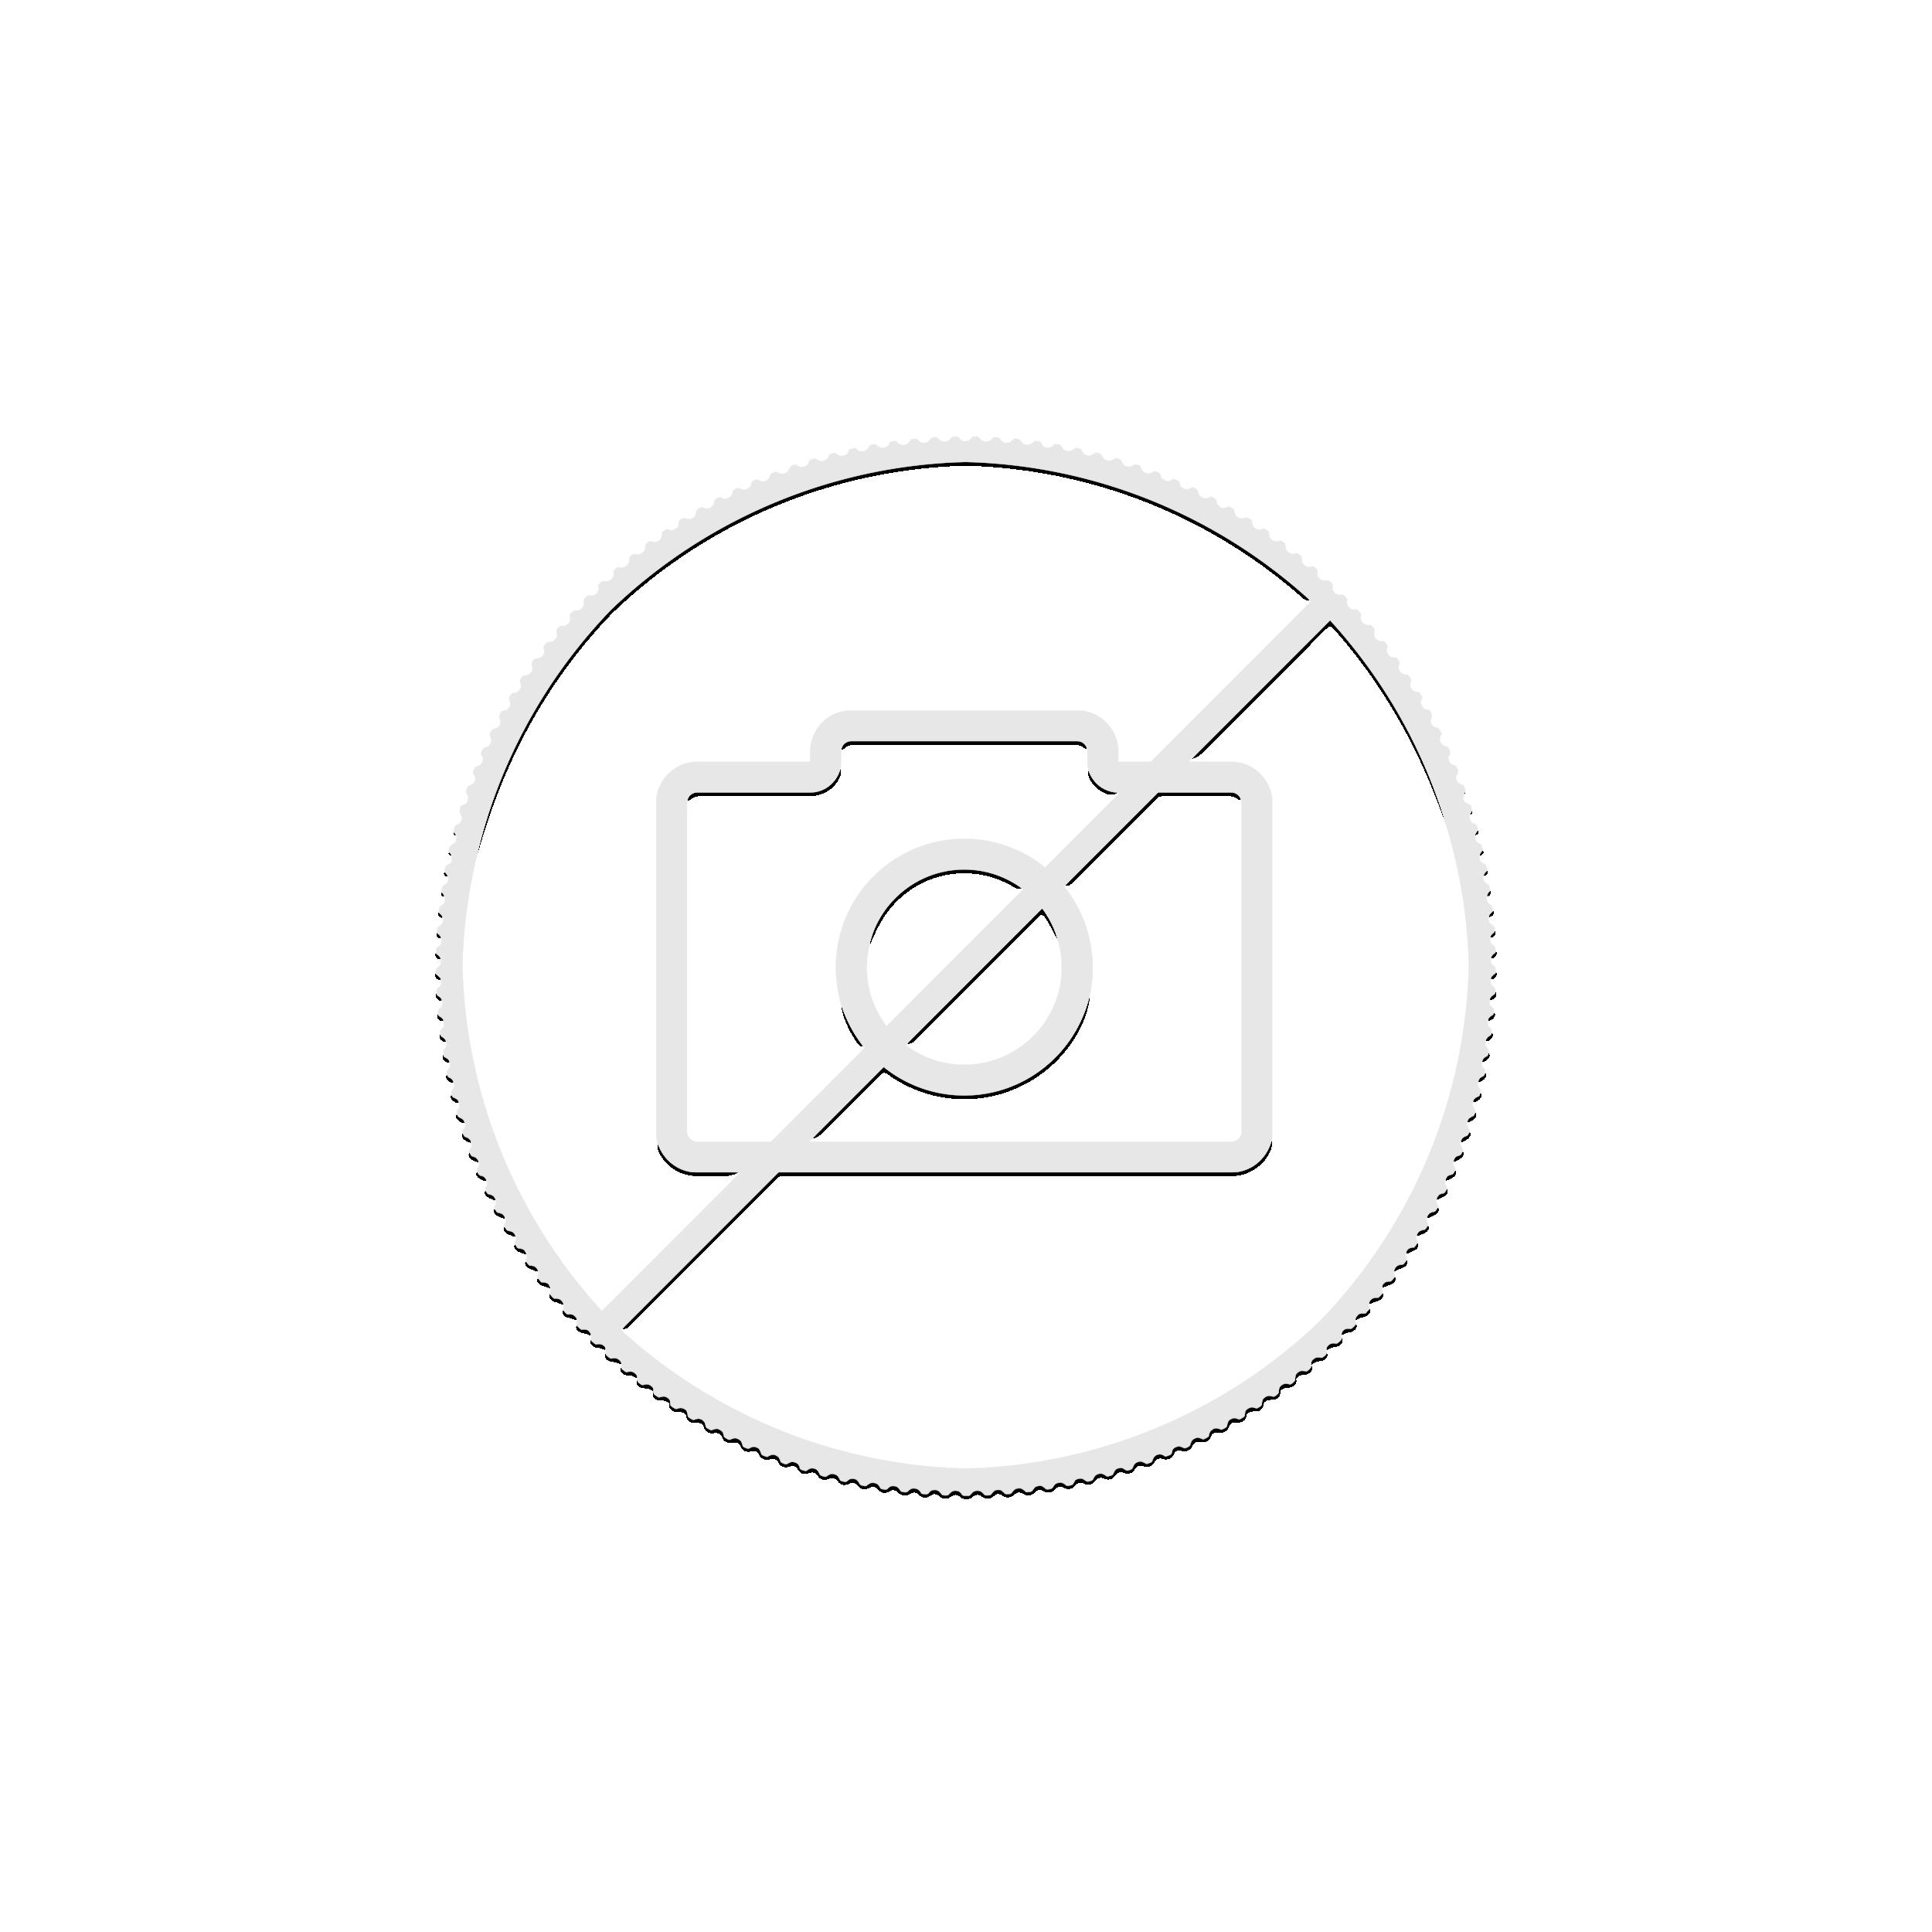 1/2 Troy ounce zilveren munt Maple Leaf 2019